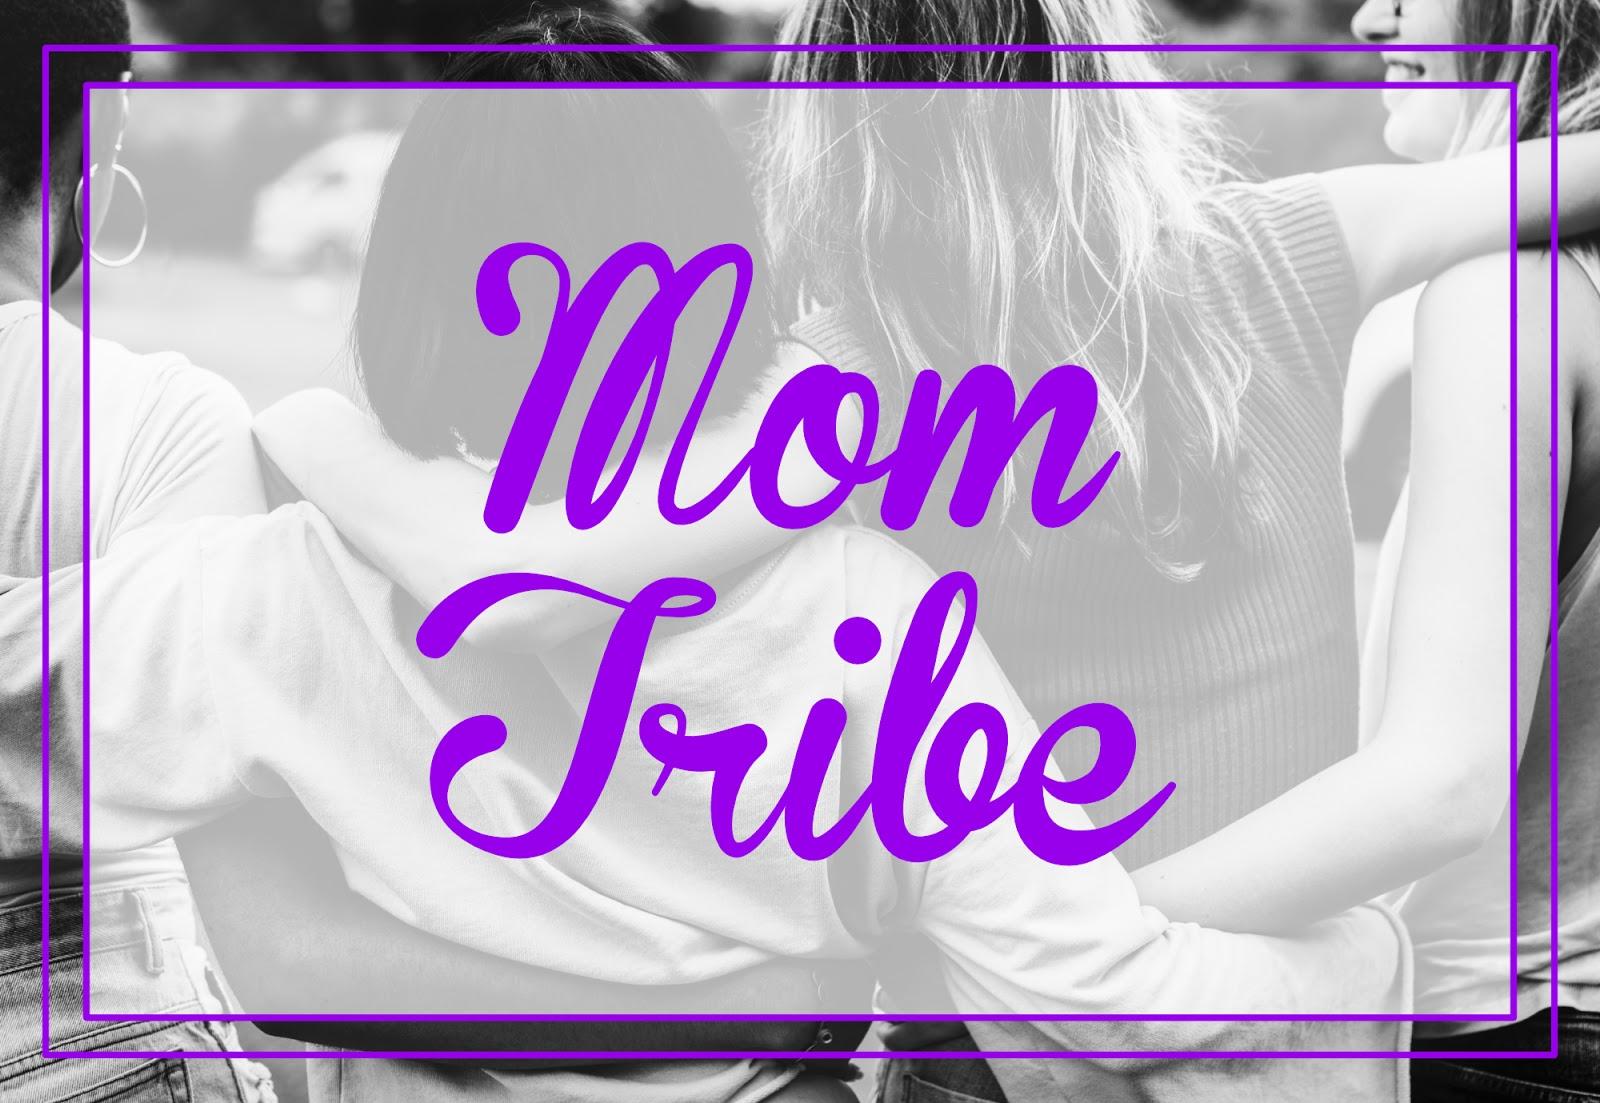 birth preparation embracing motherhood birth trauma healing birth healing traumatic birth postpartum depression anxiety mood disorders